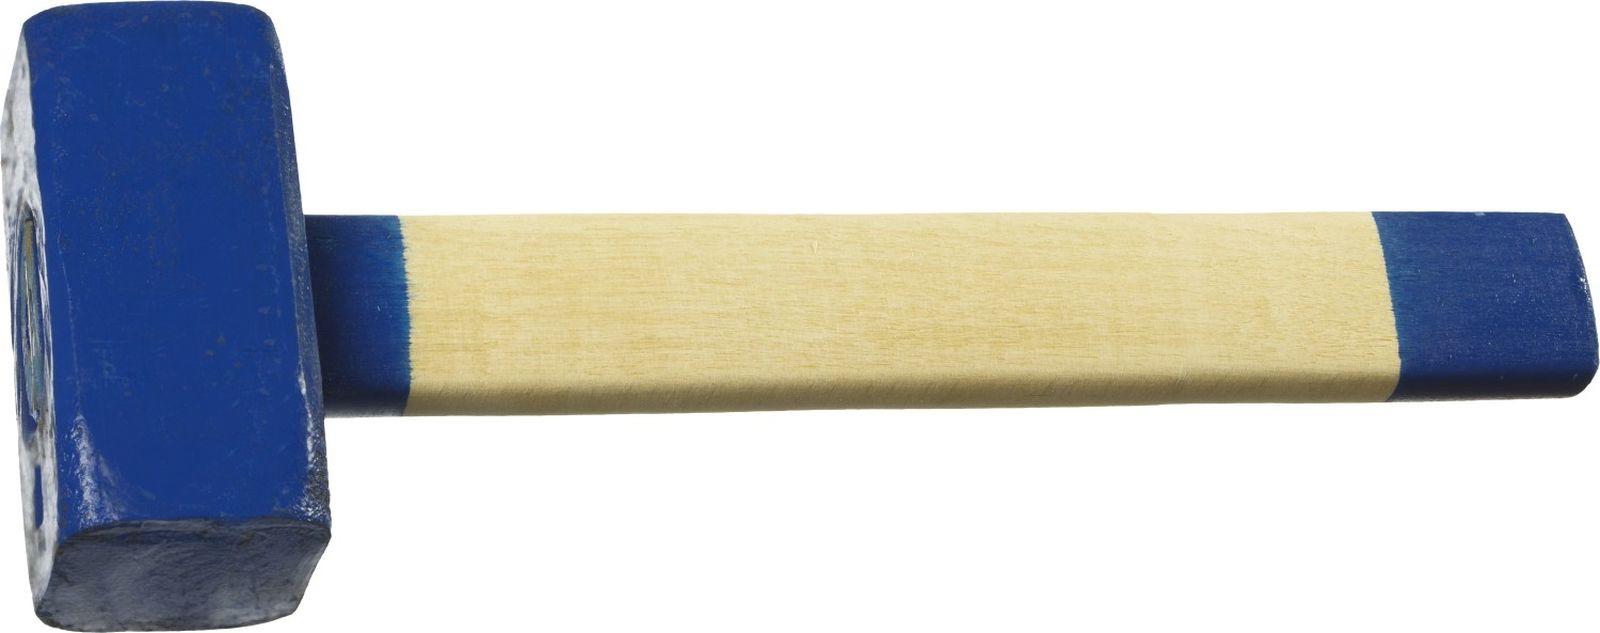 Кувалда Сибин, с деревянной рукояткой, 20133-4, 4 кг кувалда сибин 20133